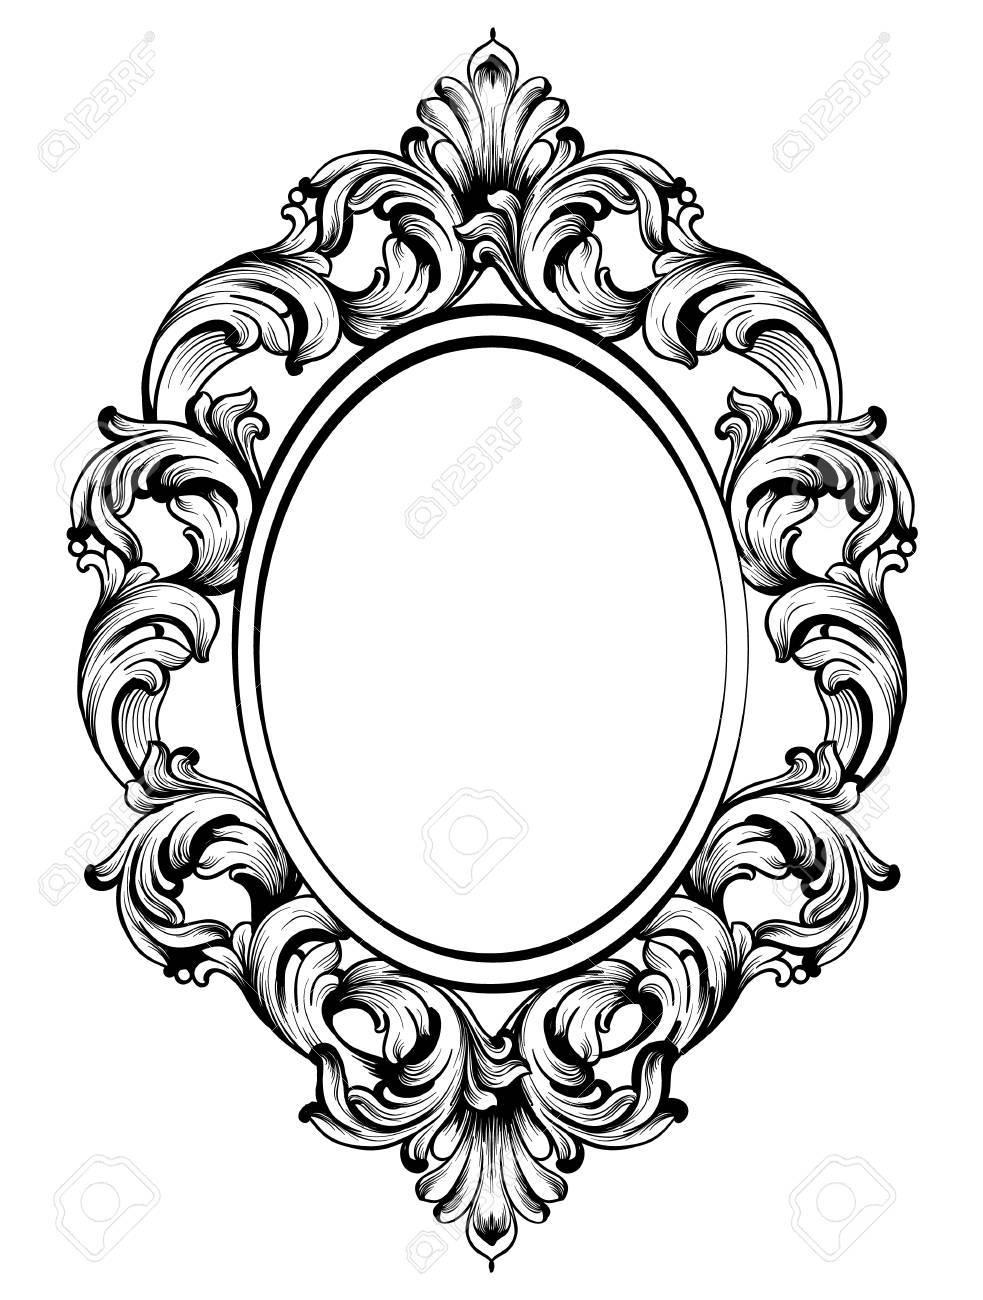 Baroque frame decor. Detailed rich ornament vector illustration.